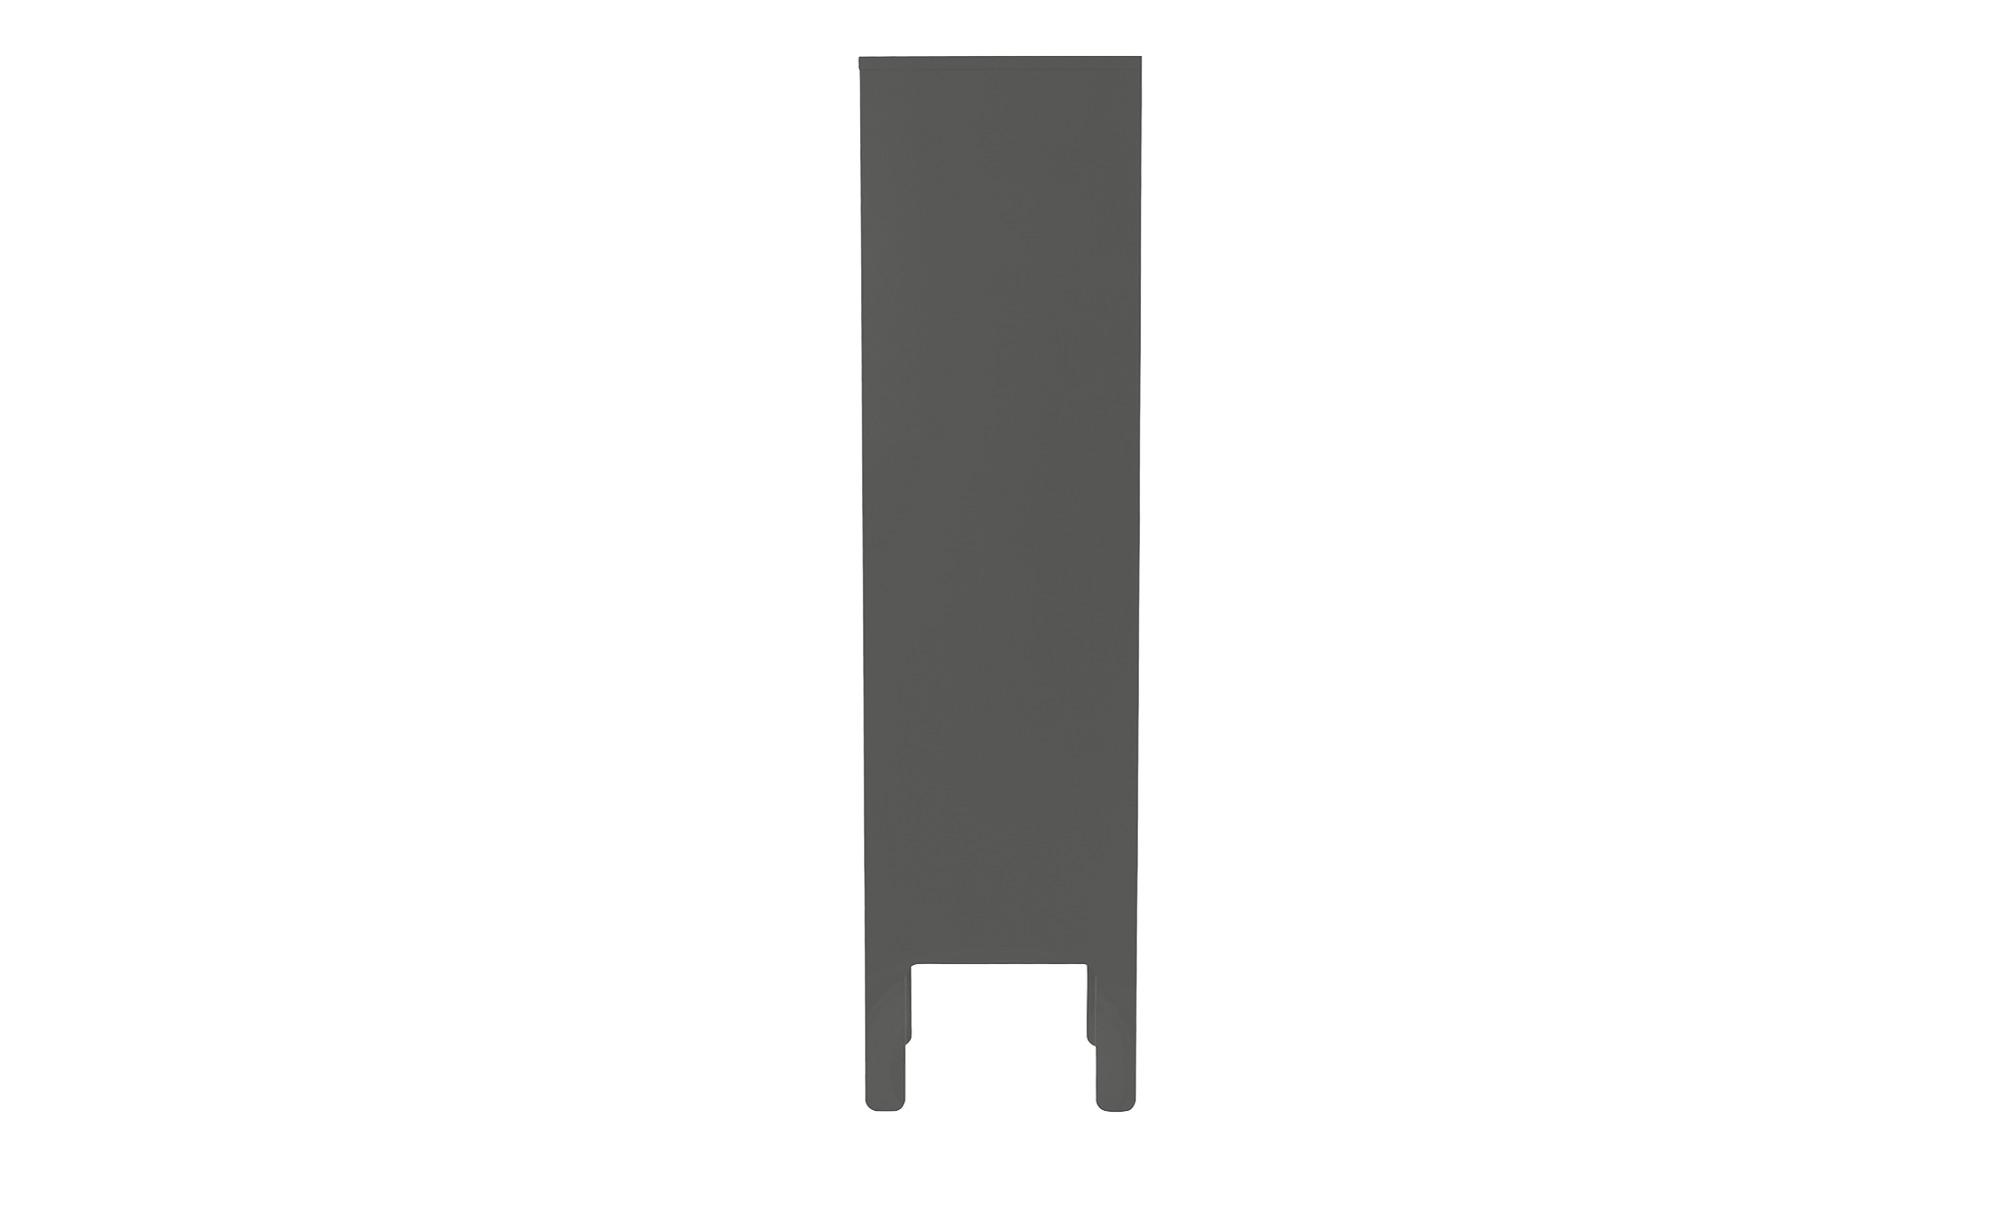 Highboard  Uno ¦ grau ¦ Maße (cm): B: 40 H: 152 T: 40 Kommoden & Sideboards > Kommoden - Höffner